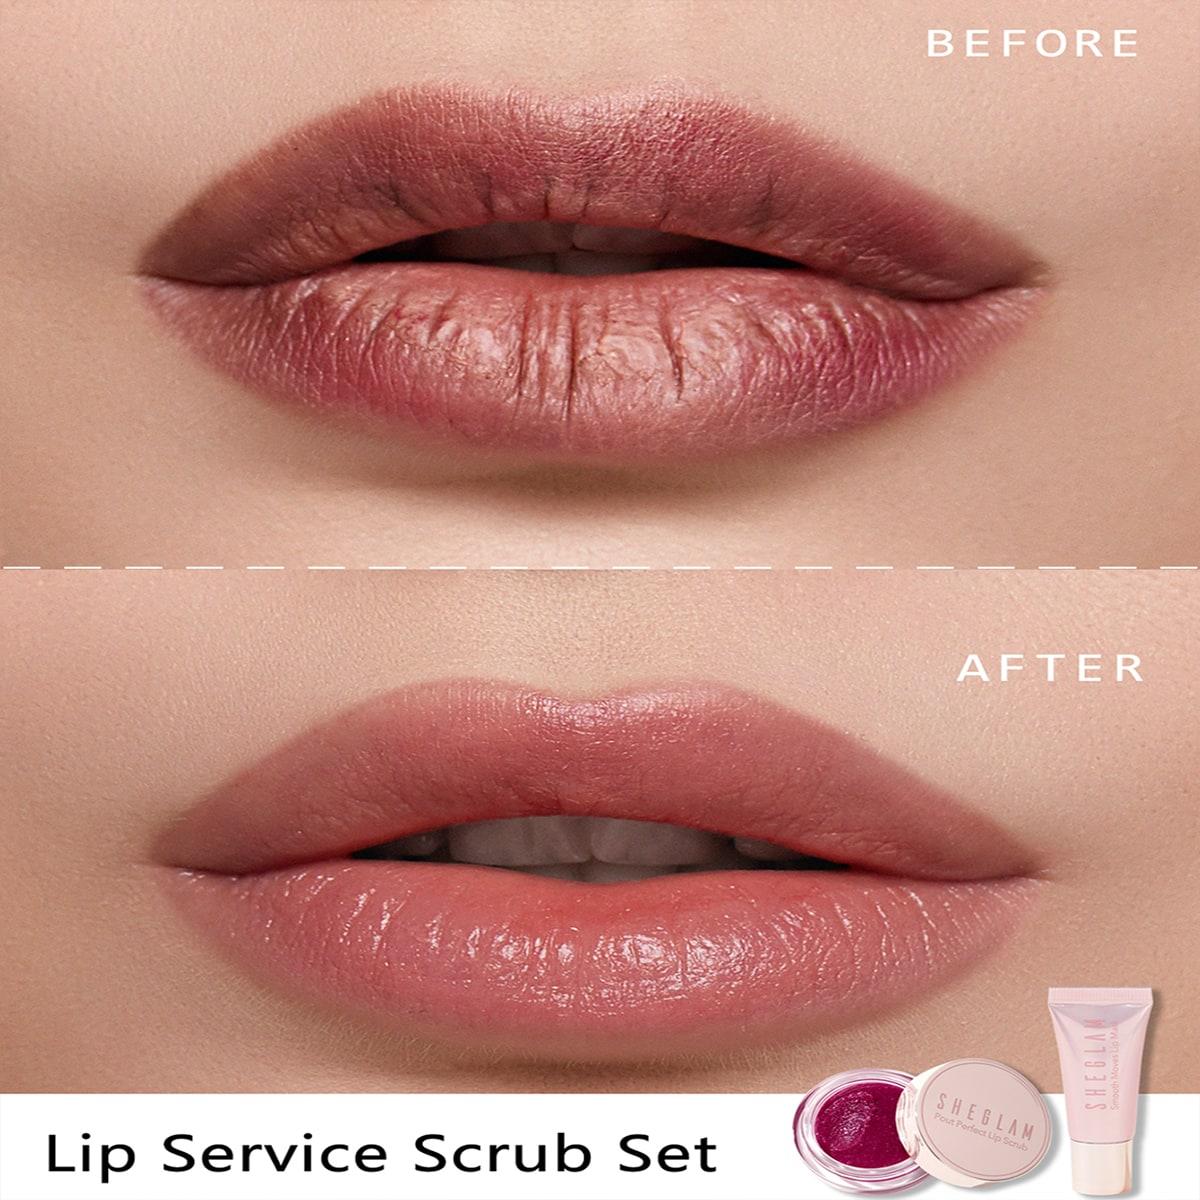 Lip Service Scrub Set